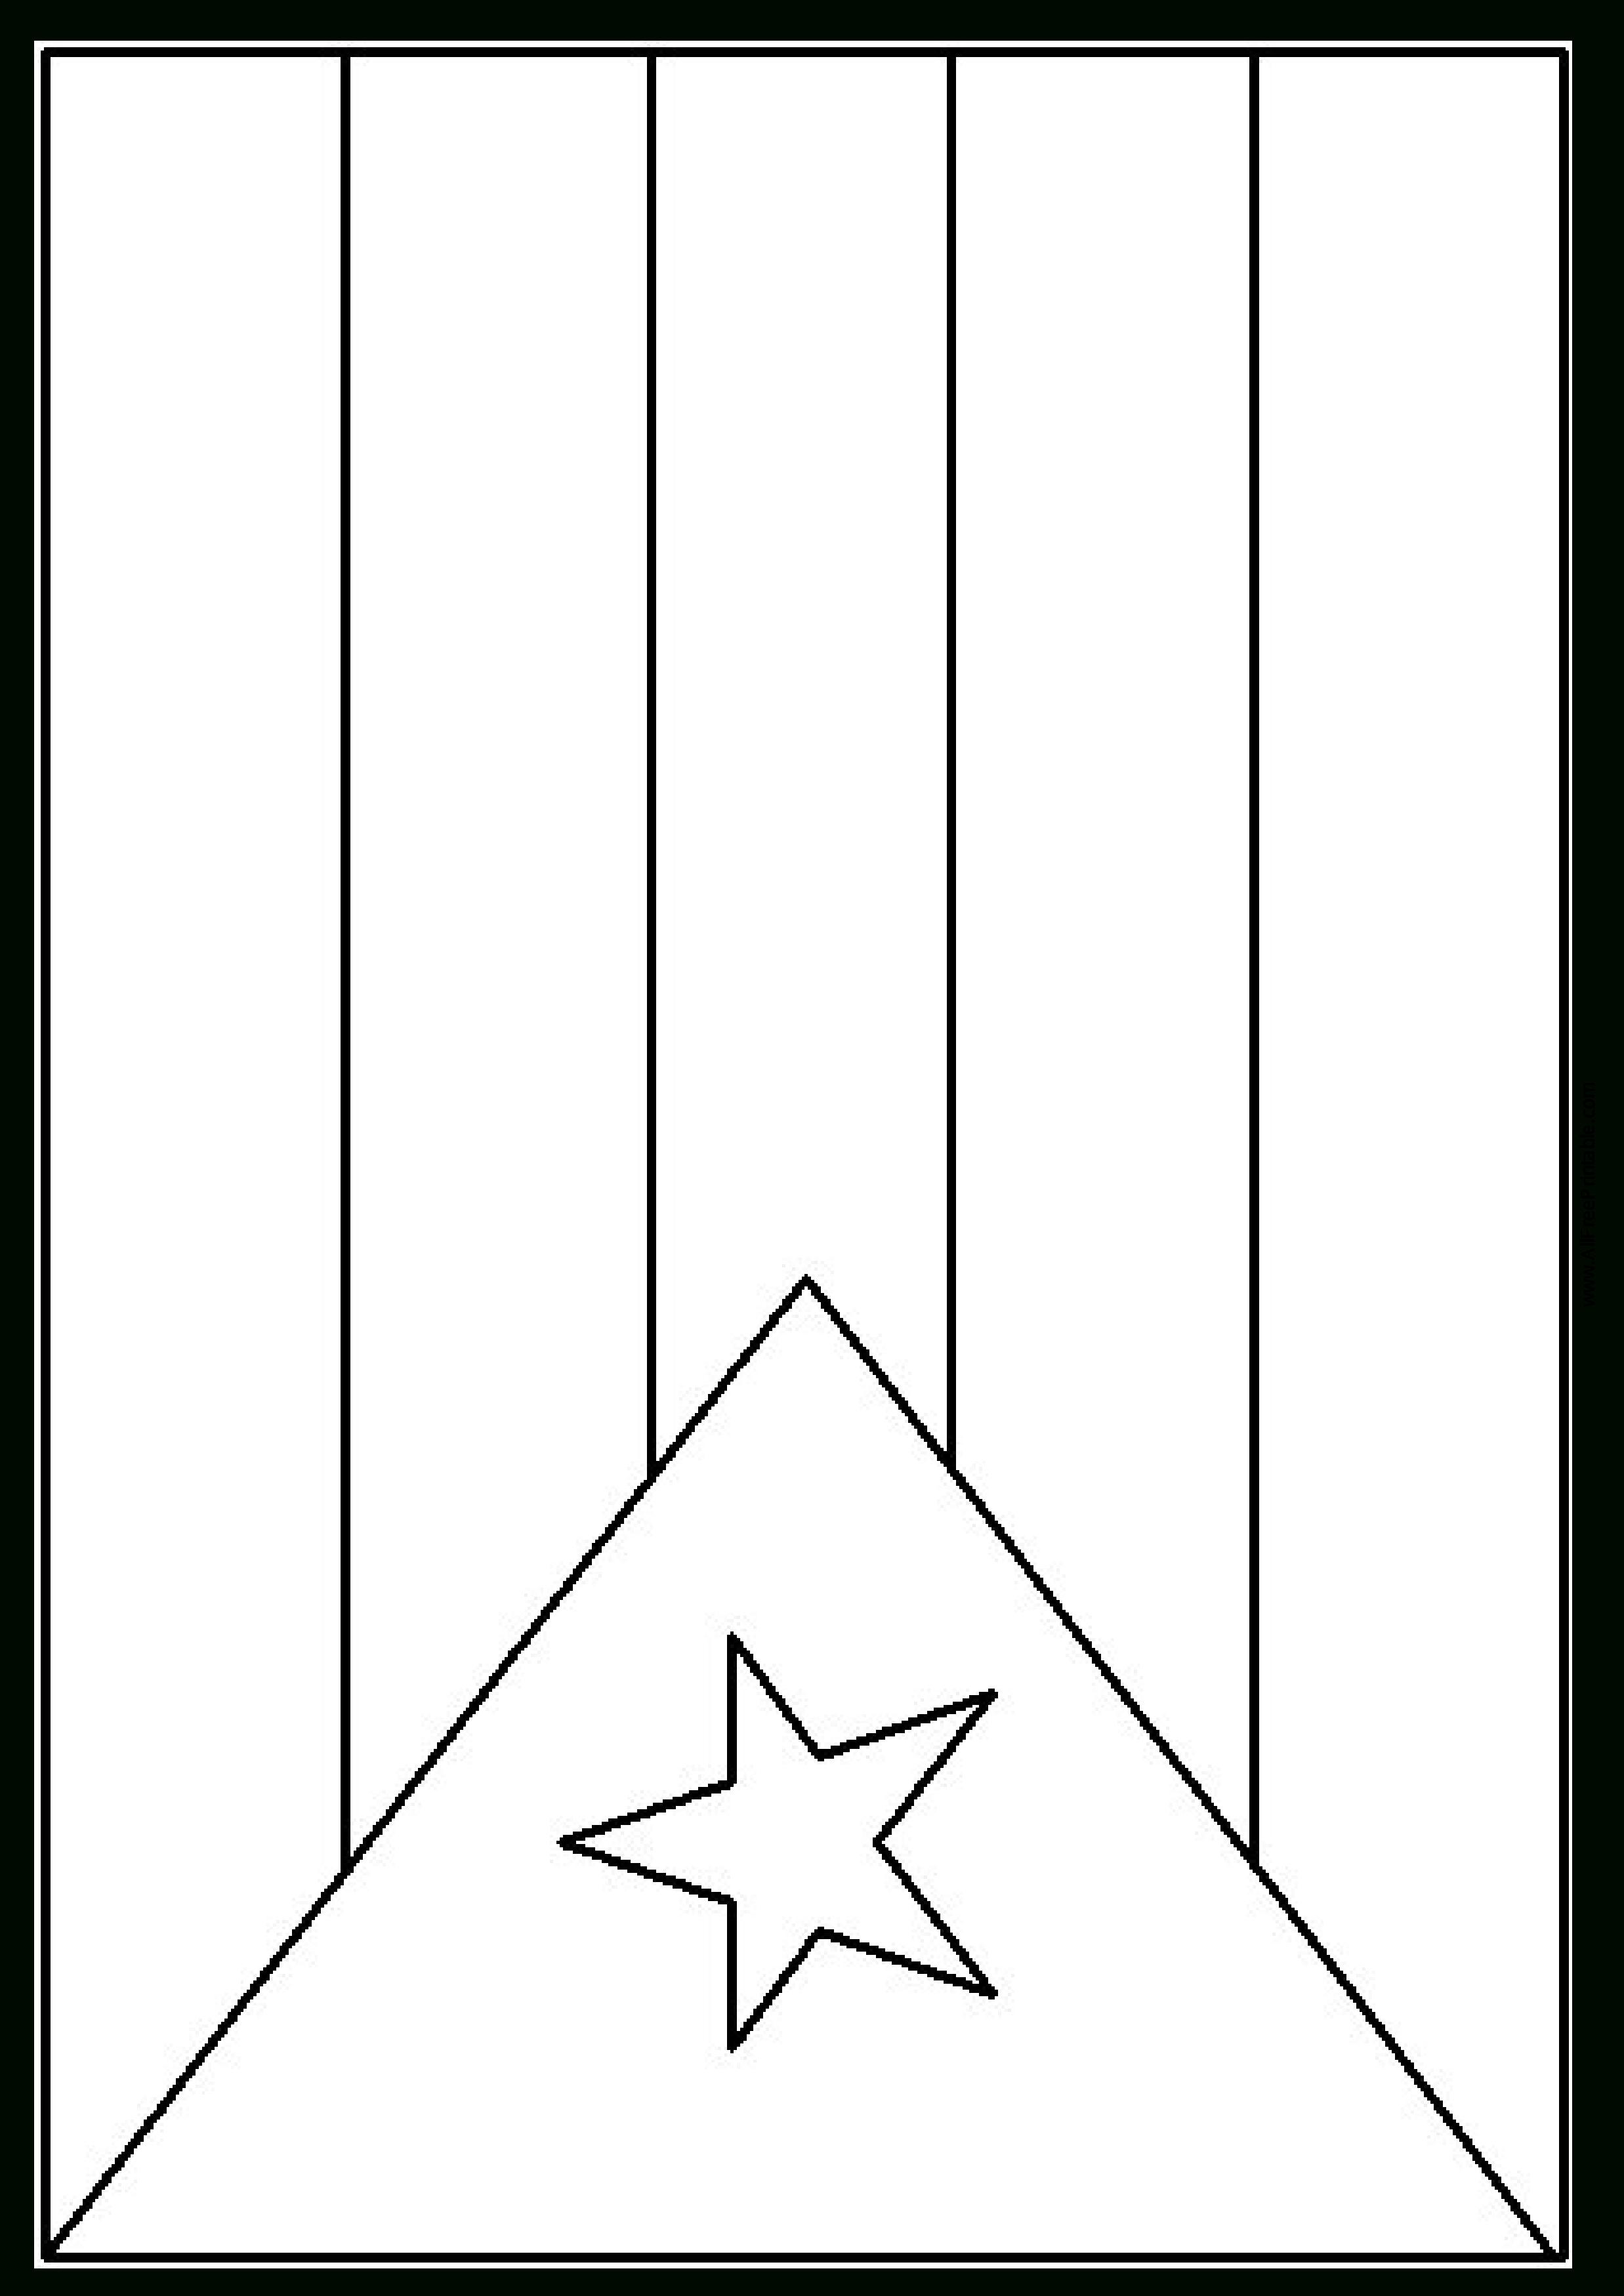 Free Puerto Rico Flag Template | Templates At Allbusinesstemplates - Free Printable Blank Flag Template